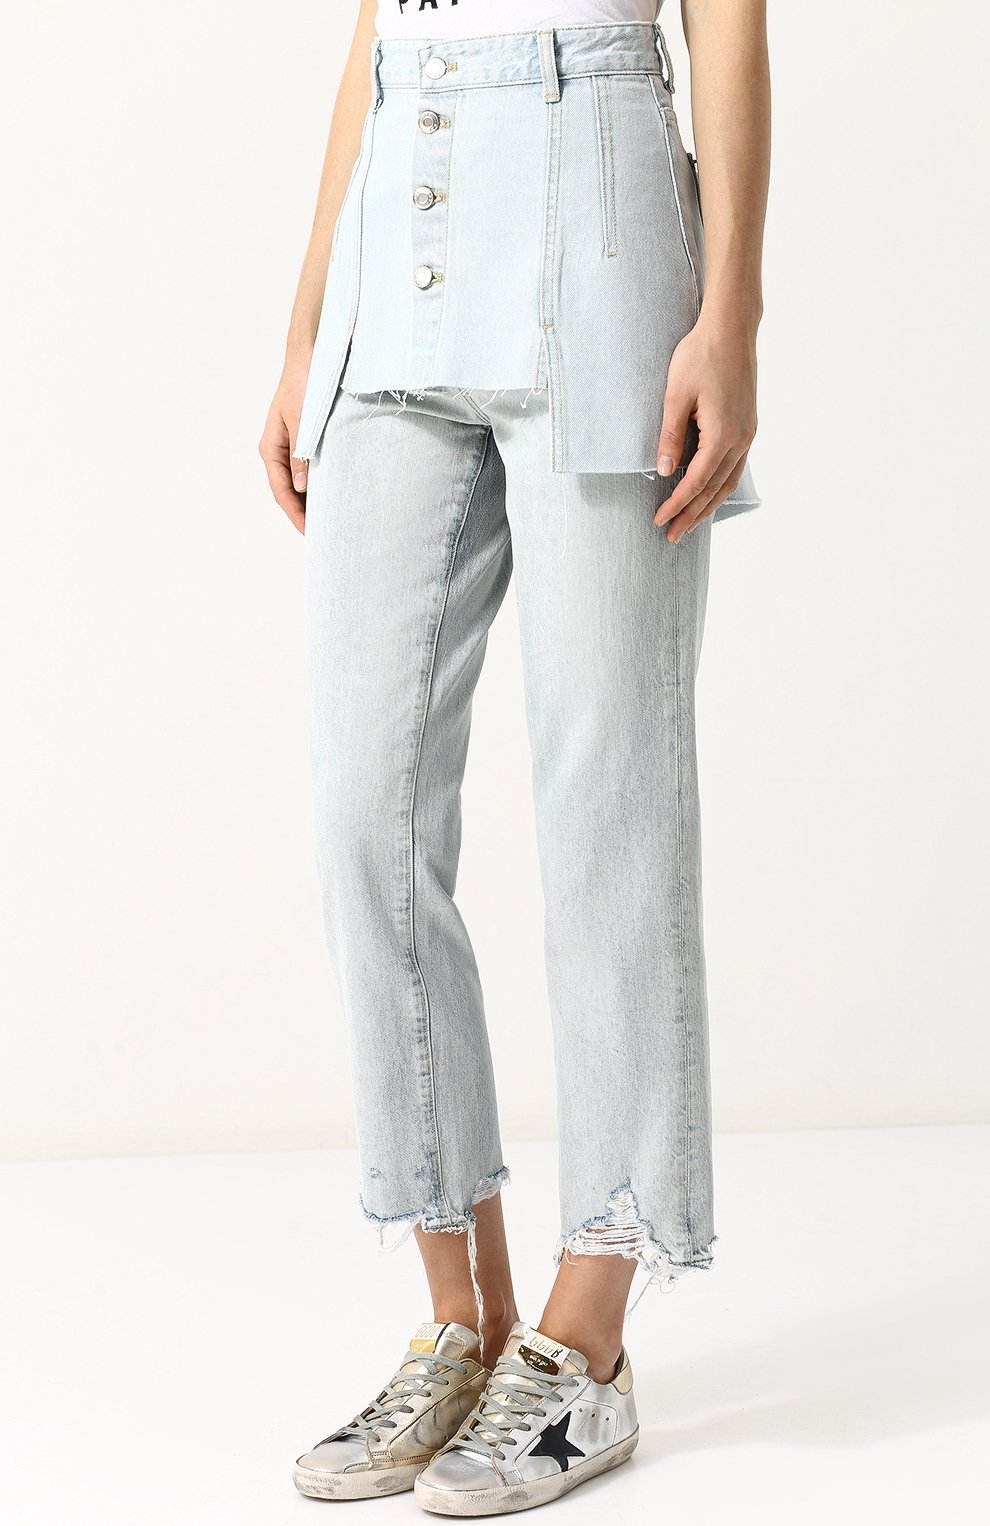 Женская джинсовая мини-юбка с потертостями STEVE J & YONI P голубого цвета, арт. PWMS2D-S01900   Фото 3